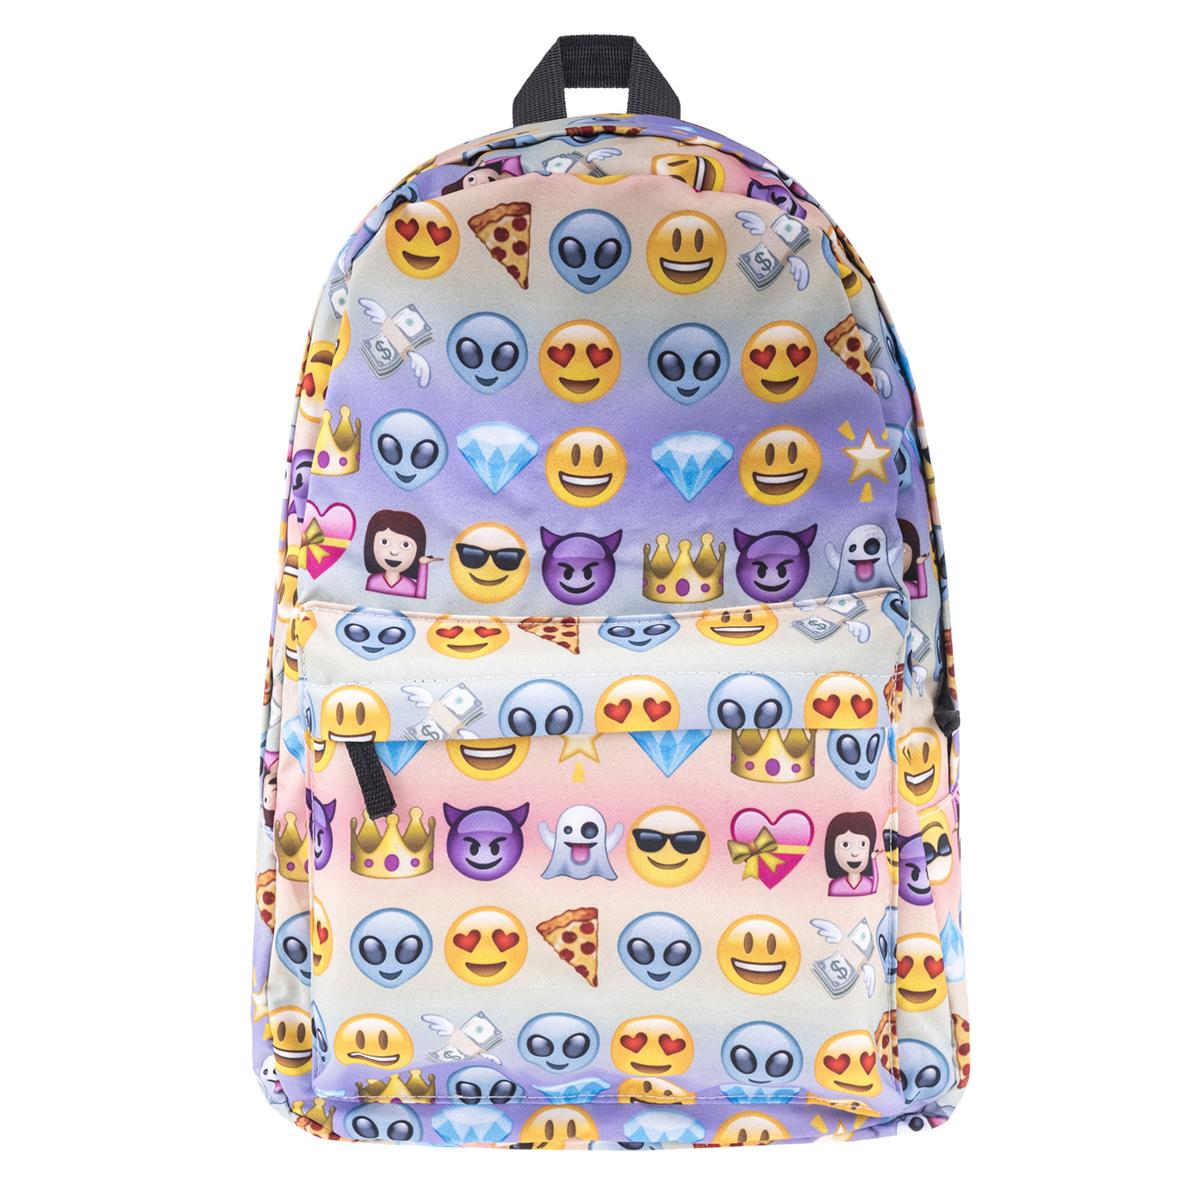 Women Stylish Chic Backpack Rainbow/Unicorn/Pineapple ...